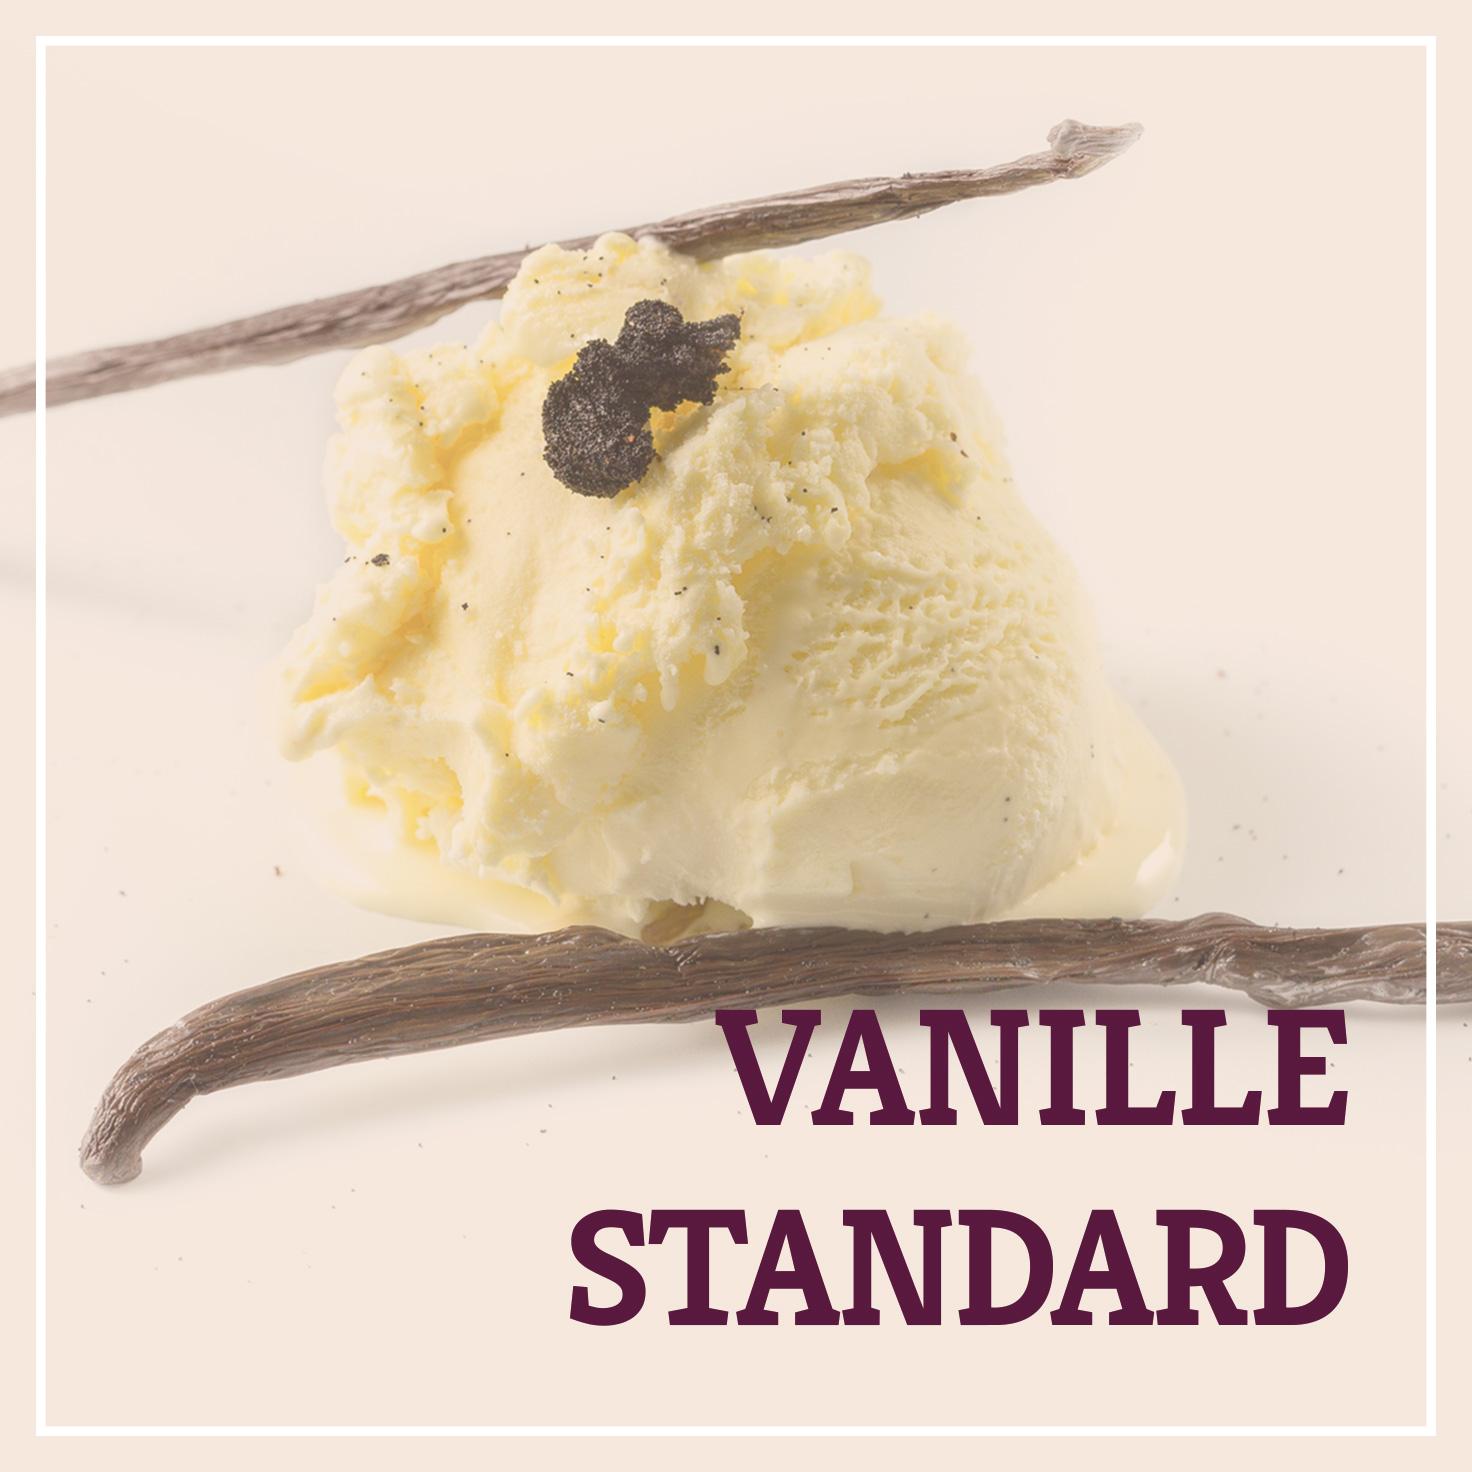 Heiss & Süß - Vanille-Standard